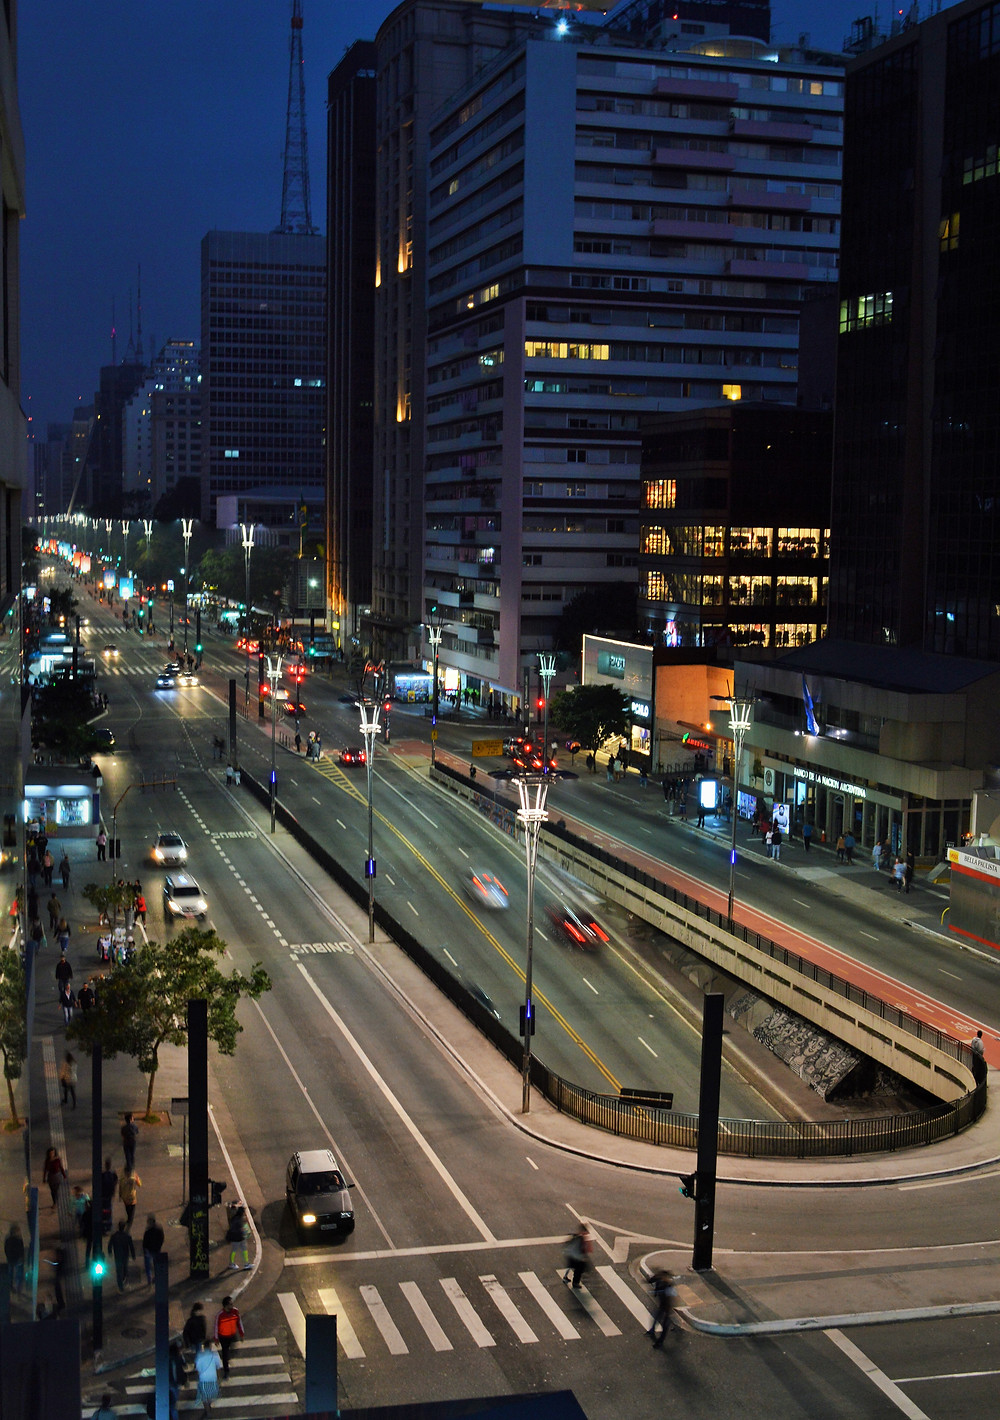 Avenida Paulista, one of the main avenues in São Paulo.